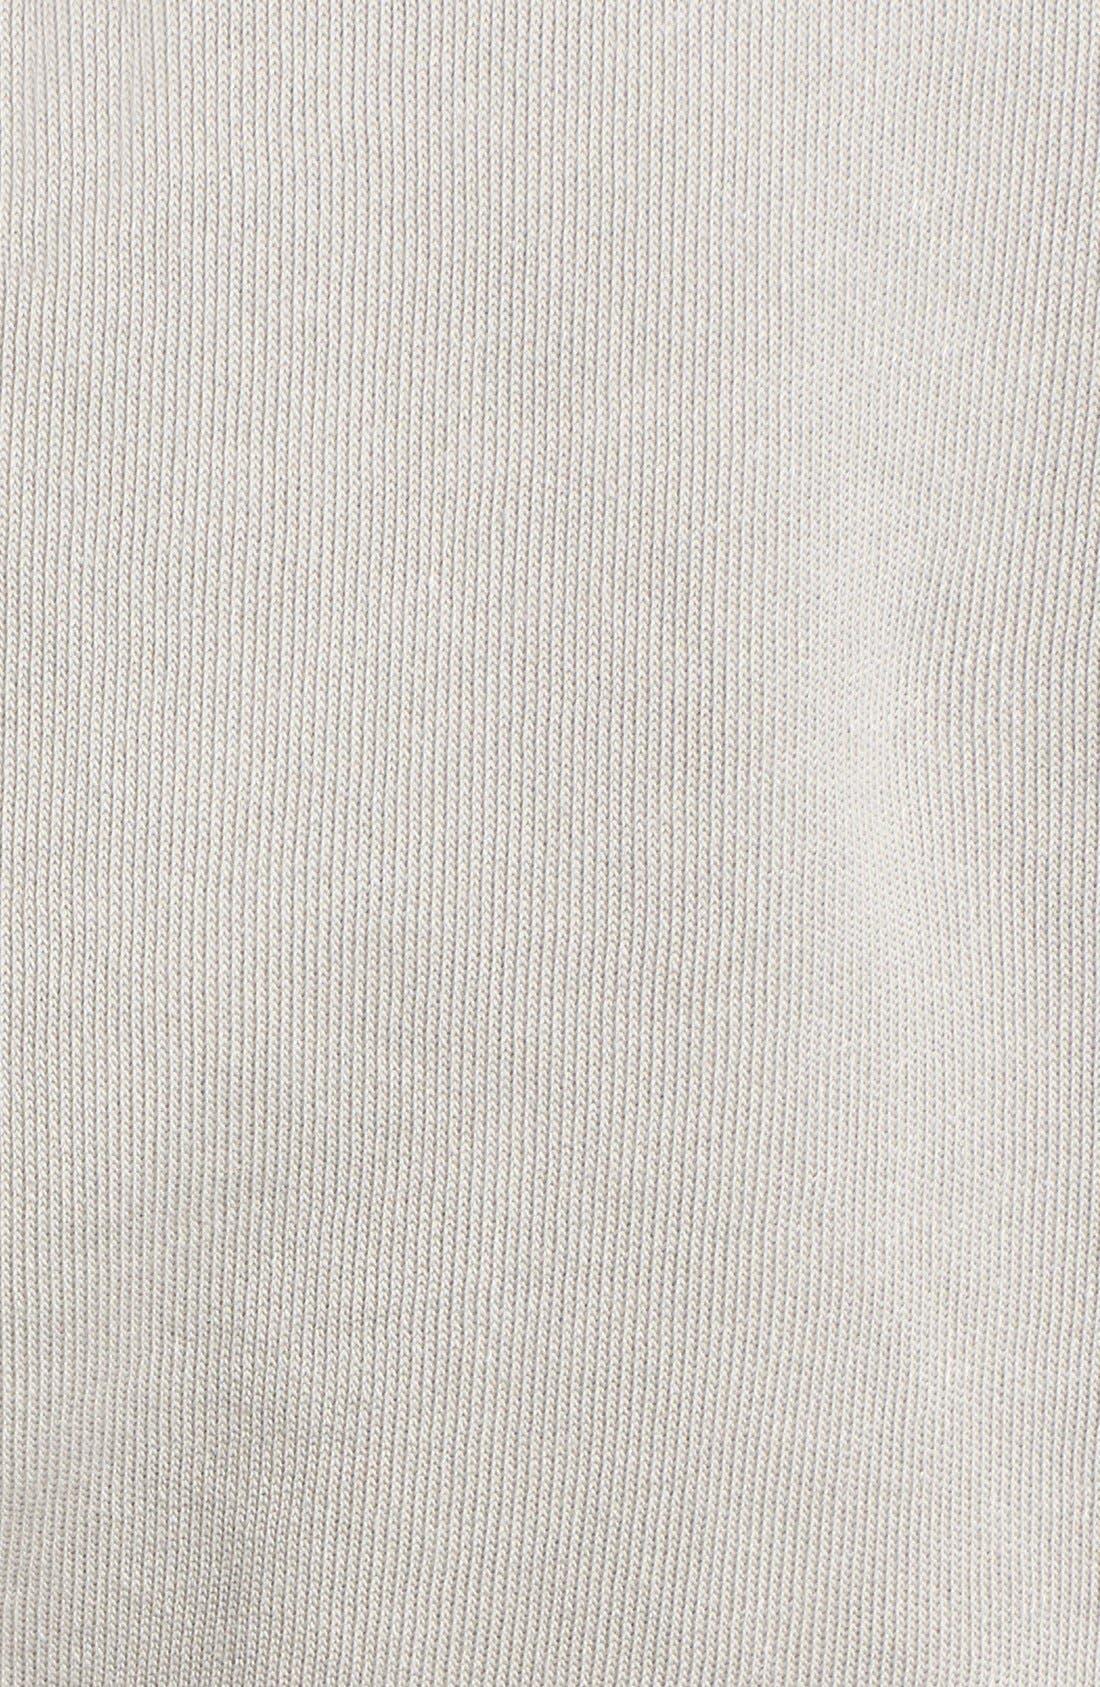 'Please Do Not Disturb' Hooded Sweatshirt,                             Alternate thumbnail 3, color,                             060